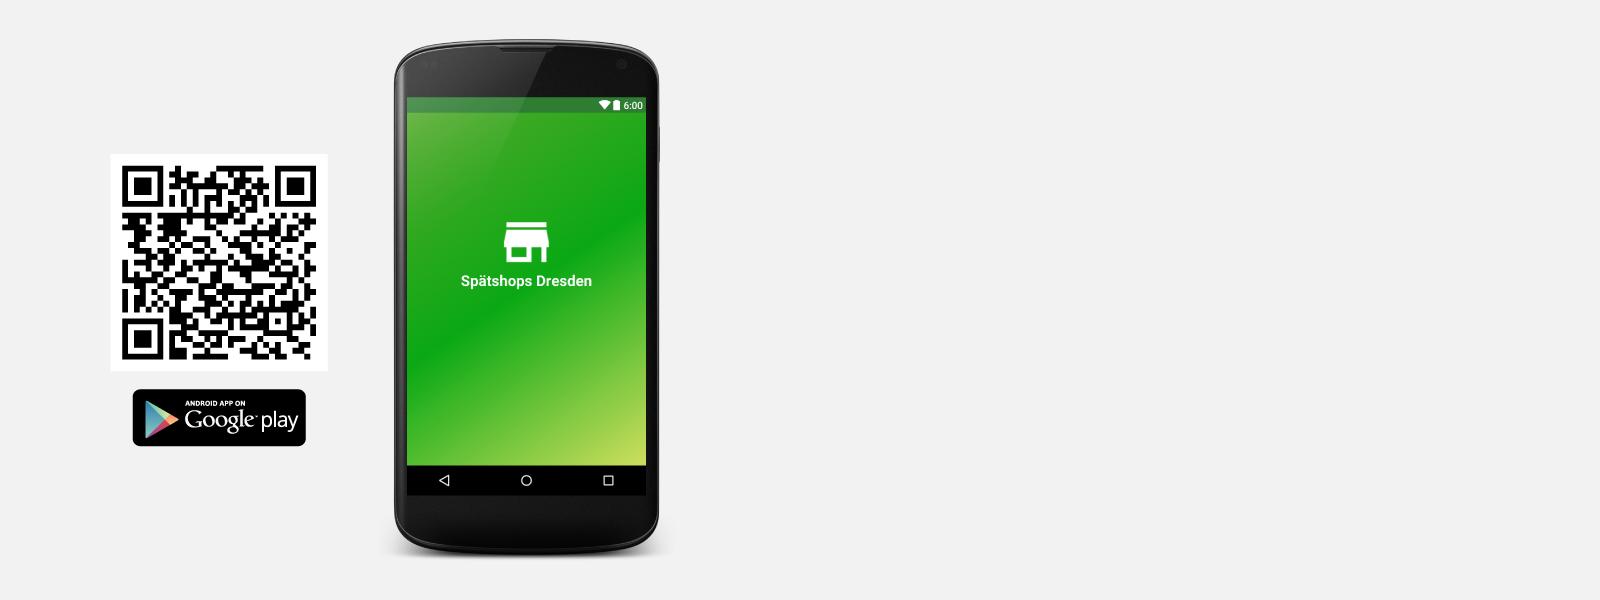 Verfügbar auf Google Play